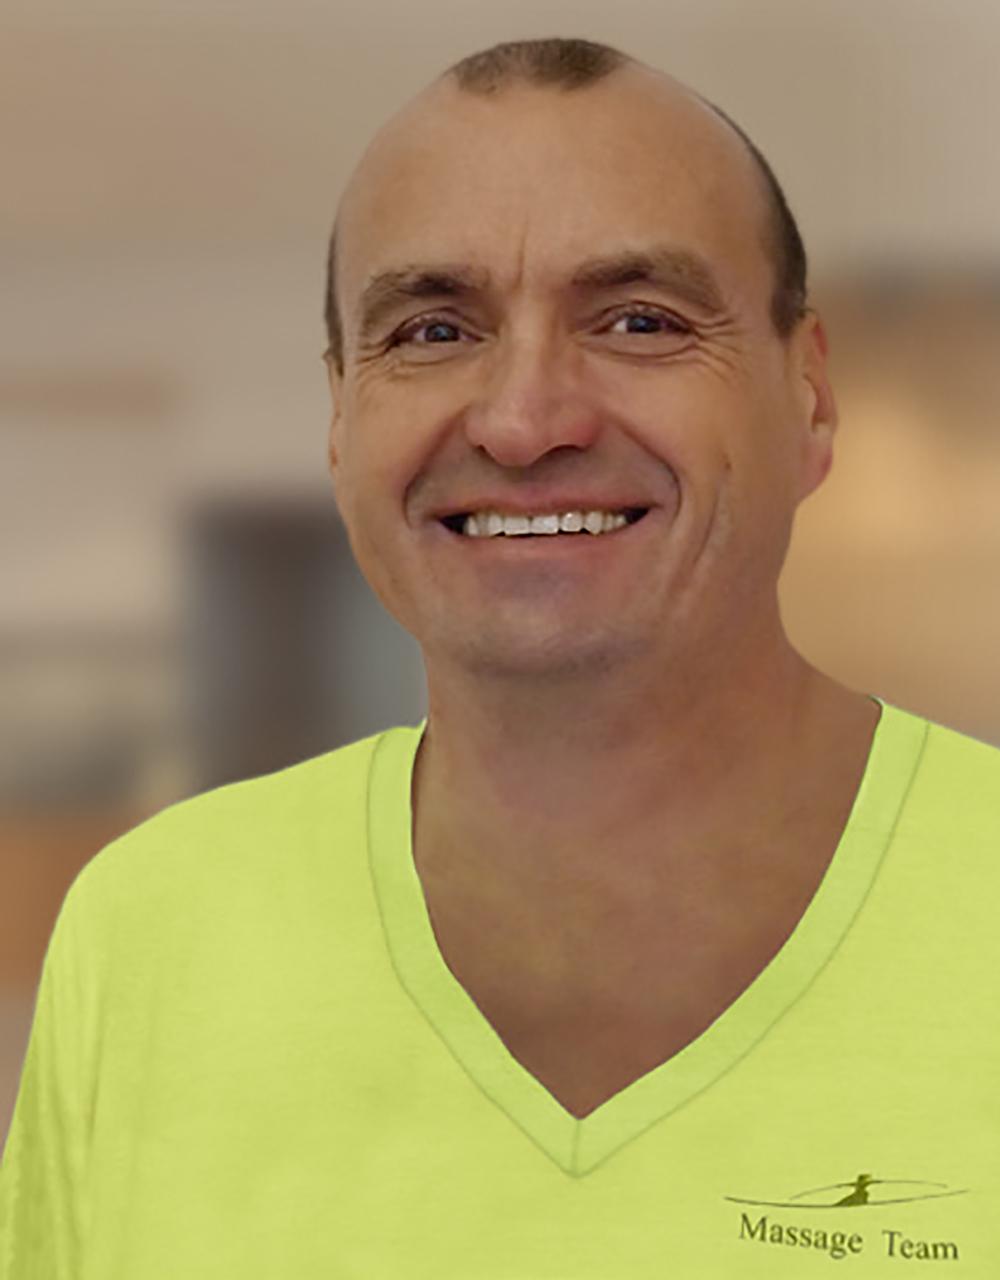 Gerd Haase geboren, 1965 in Woldegk